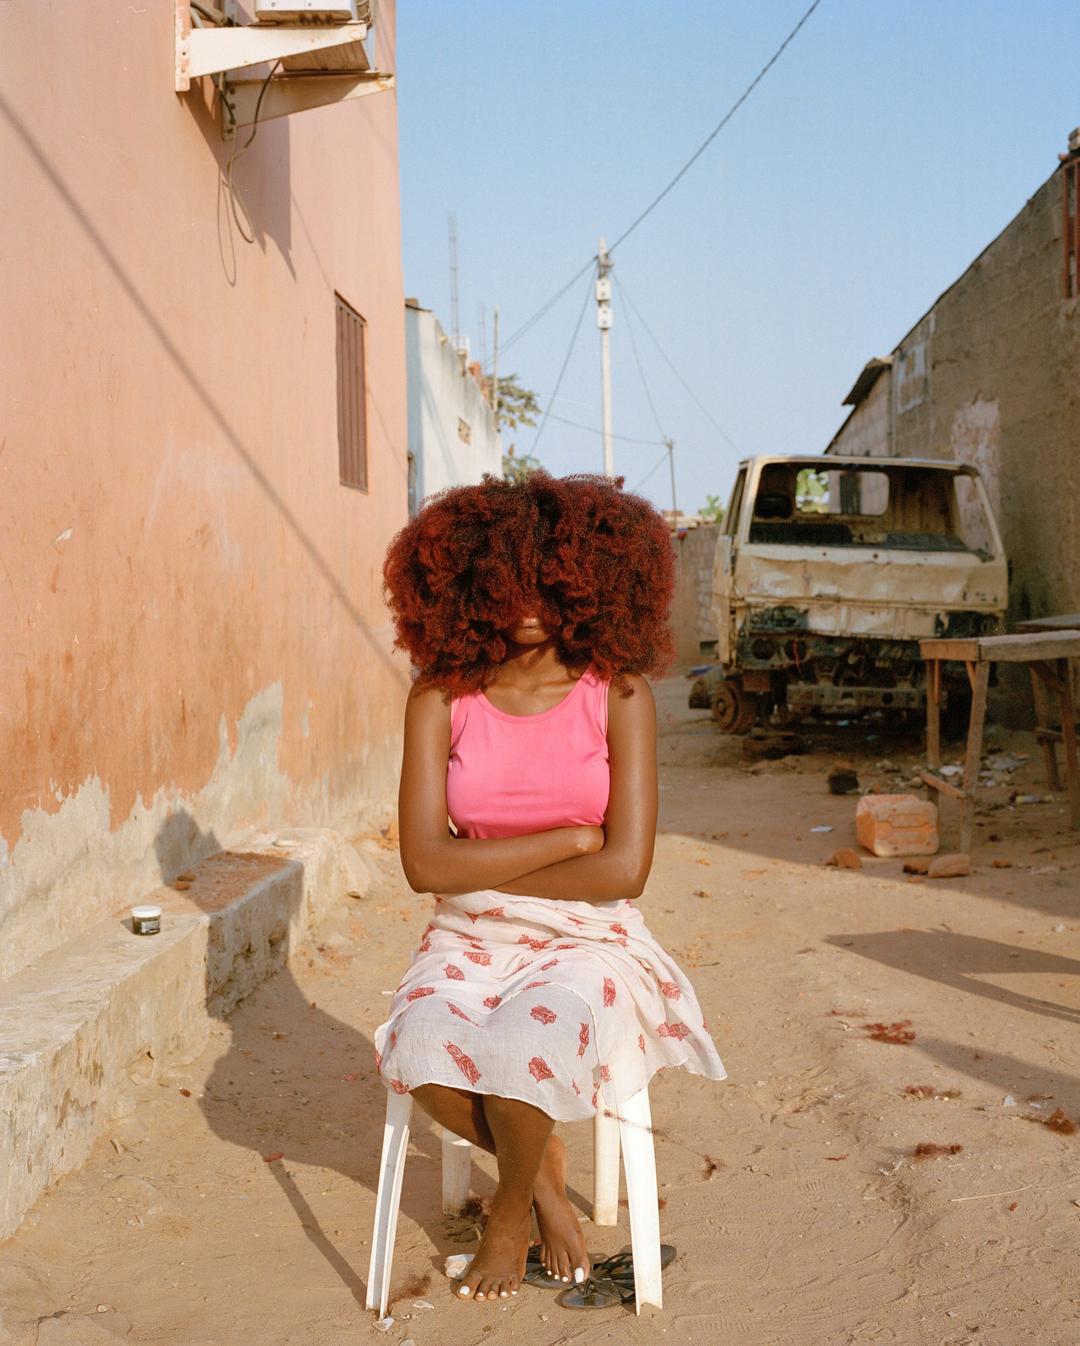 'La Belle de Luanda' © Em Regnier